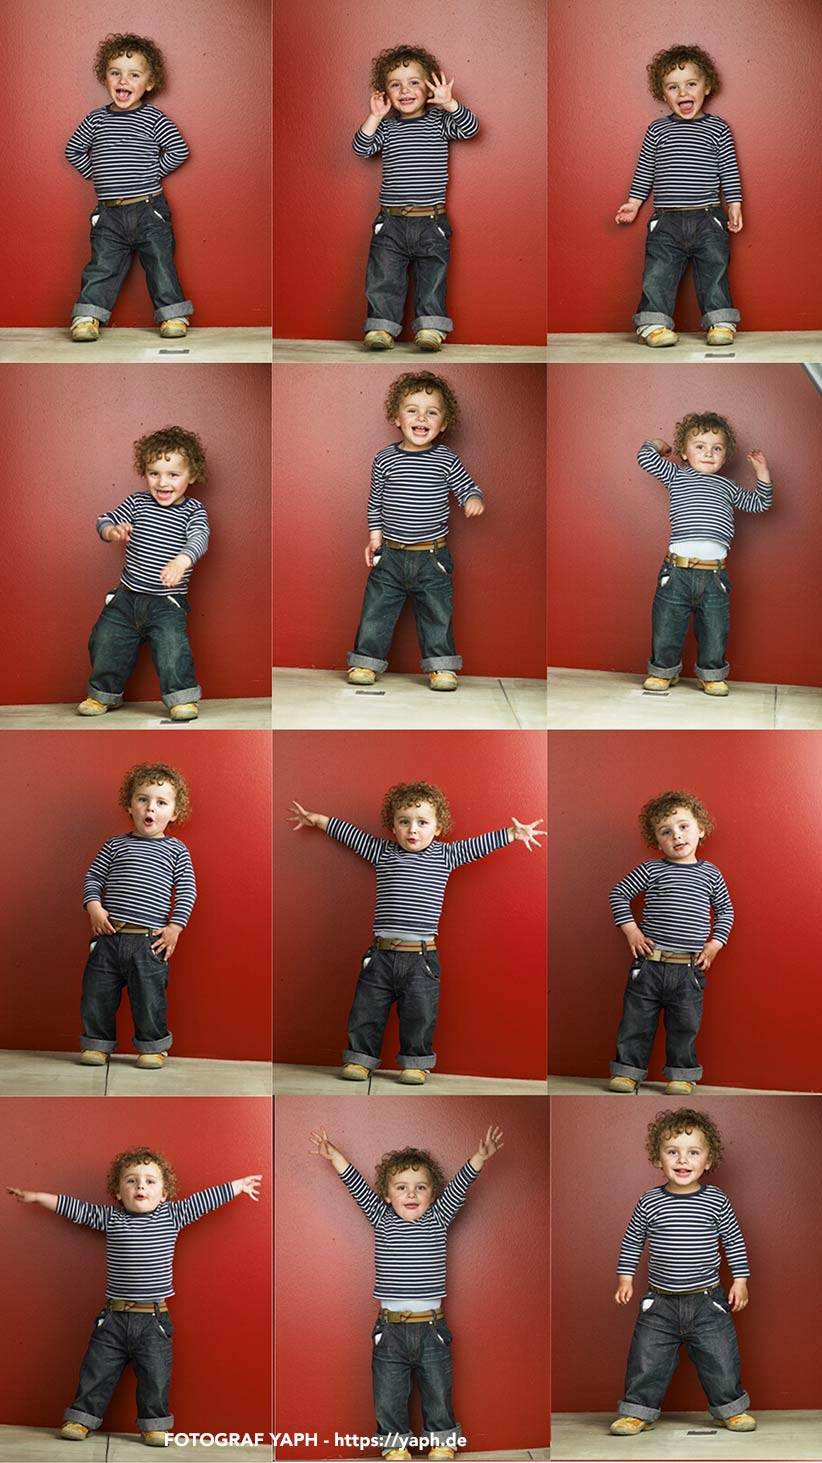 FOTOGRAF YAPH - Kinderfotos Trier